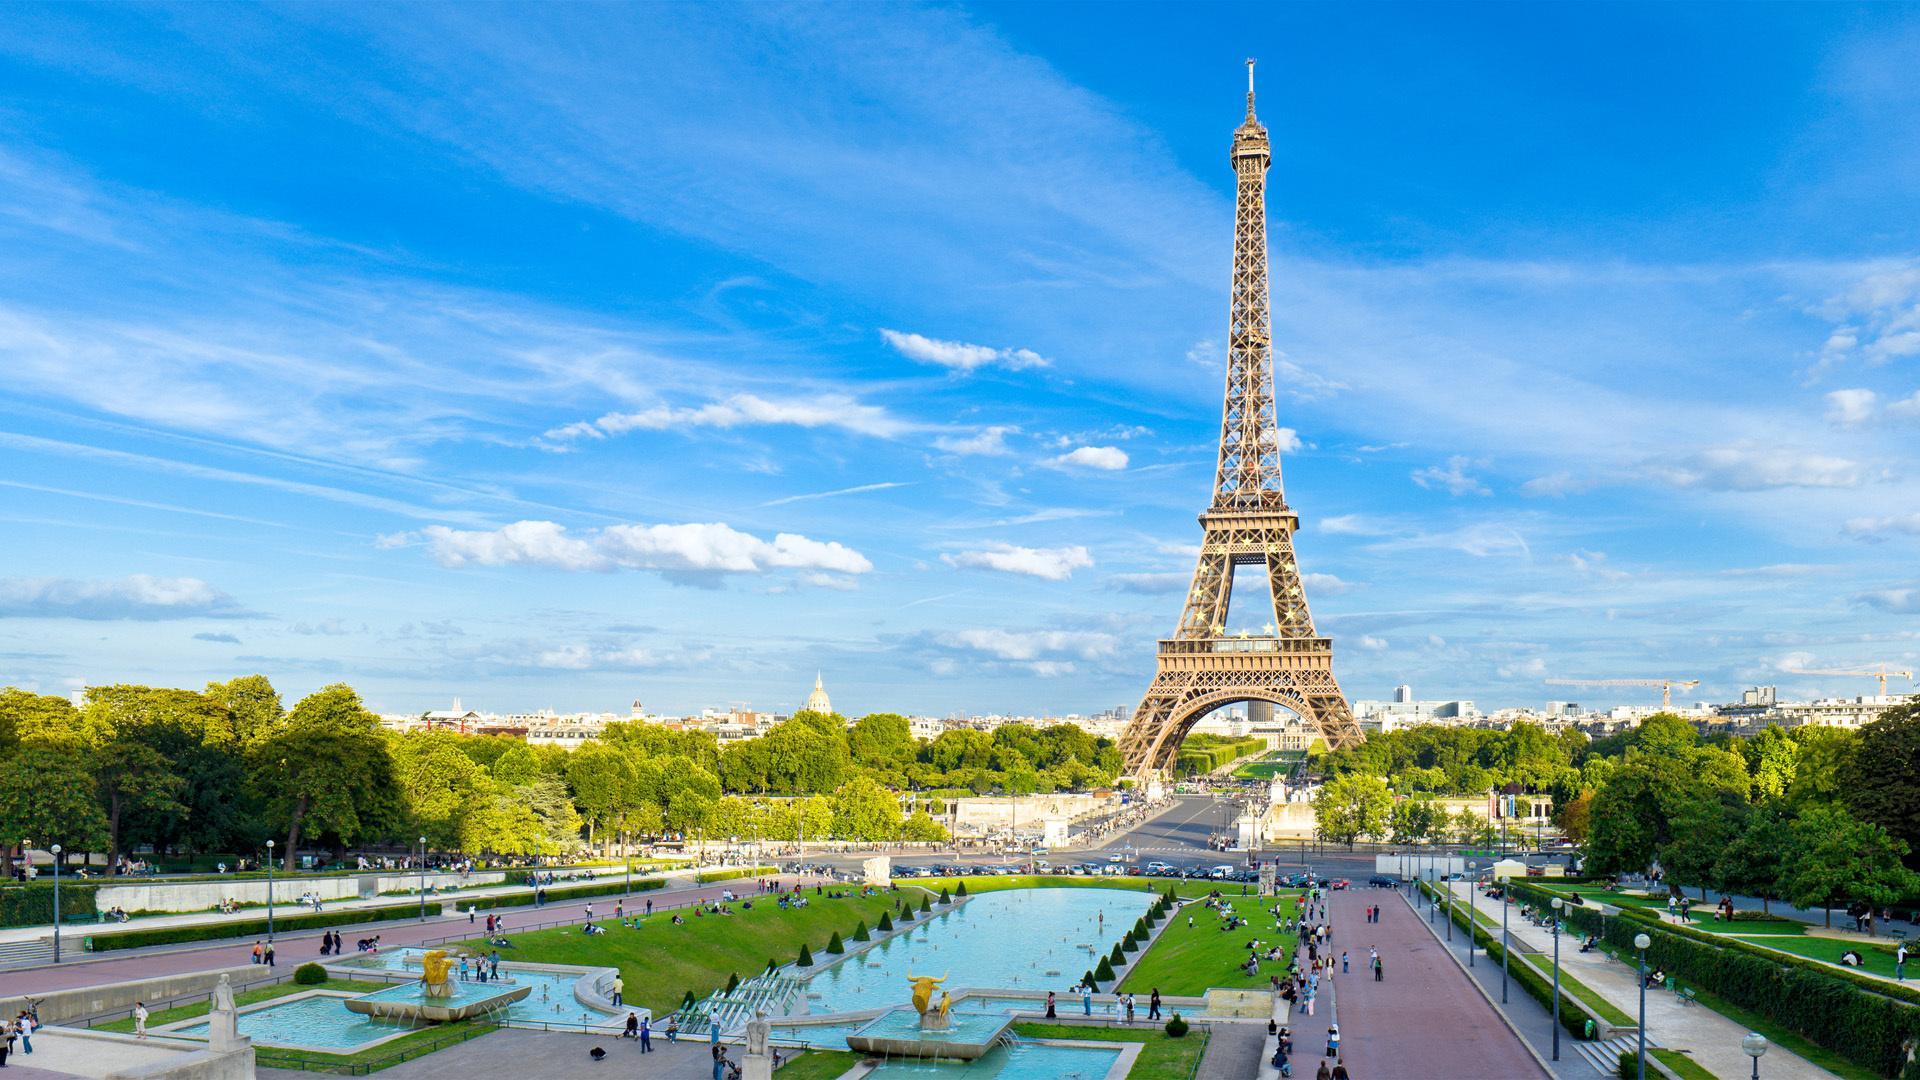 Париж, лето обои для рабочего стола ...: hq-wallpapers.ru/wallpapers/city/pic7682_raz1920x1080